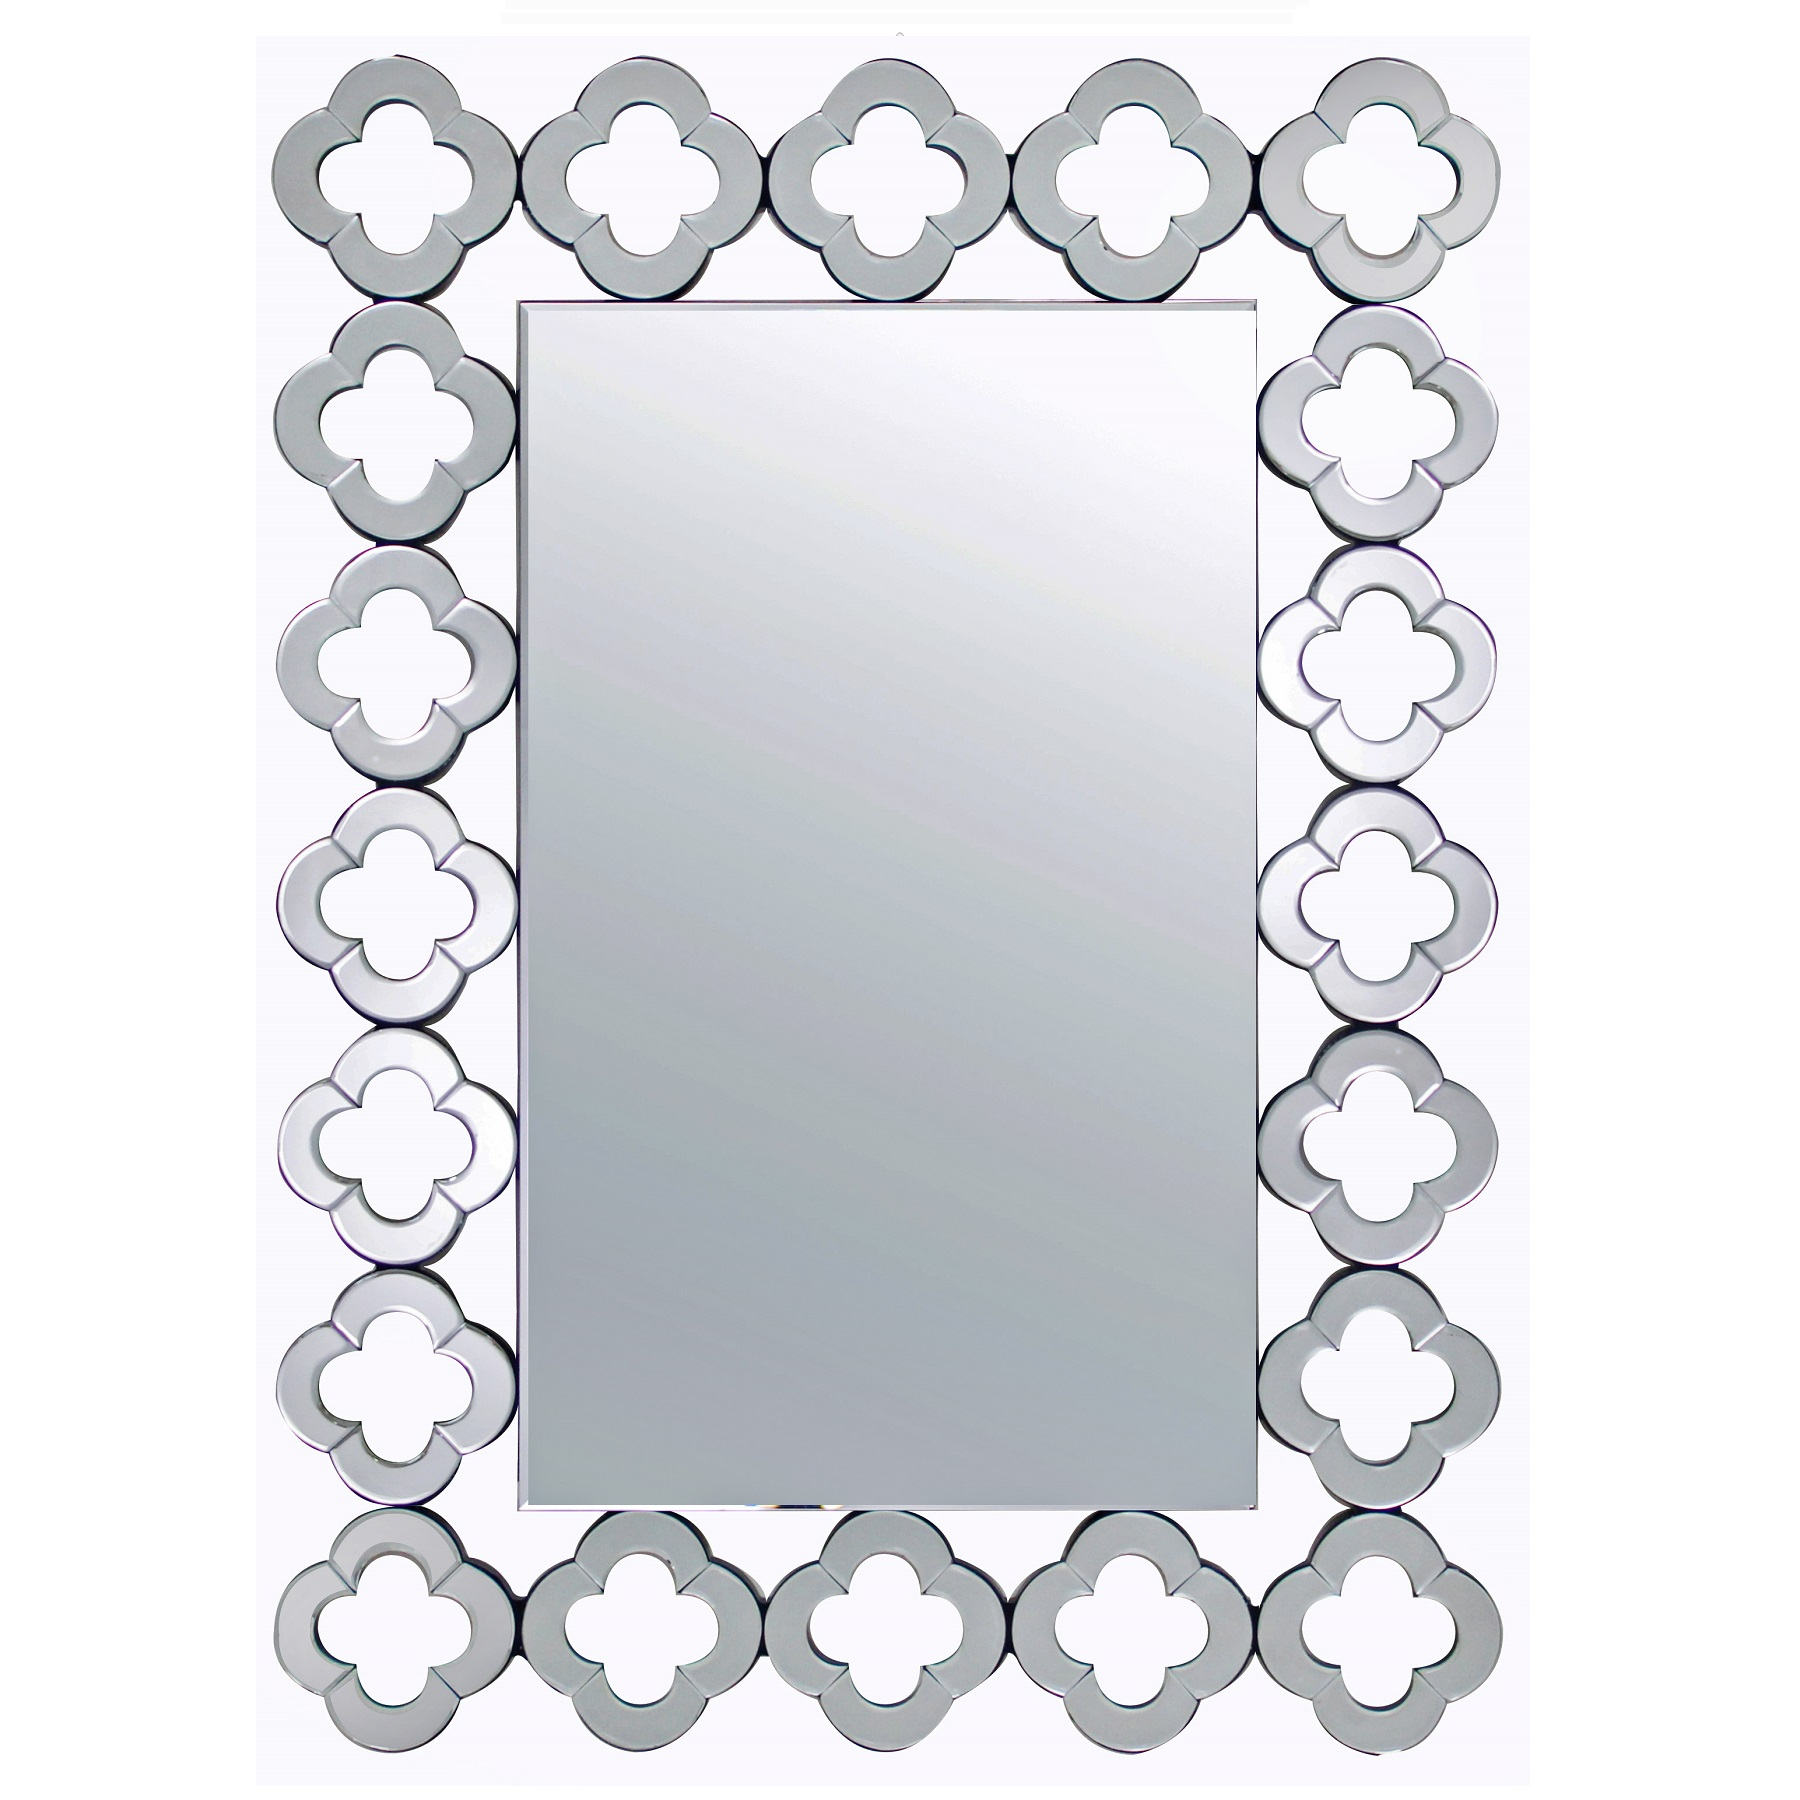 Купить Настенное зеркало Celebrazione, inmyroom, Китай